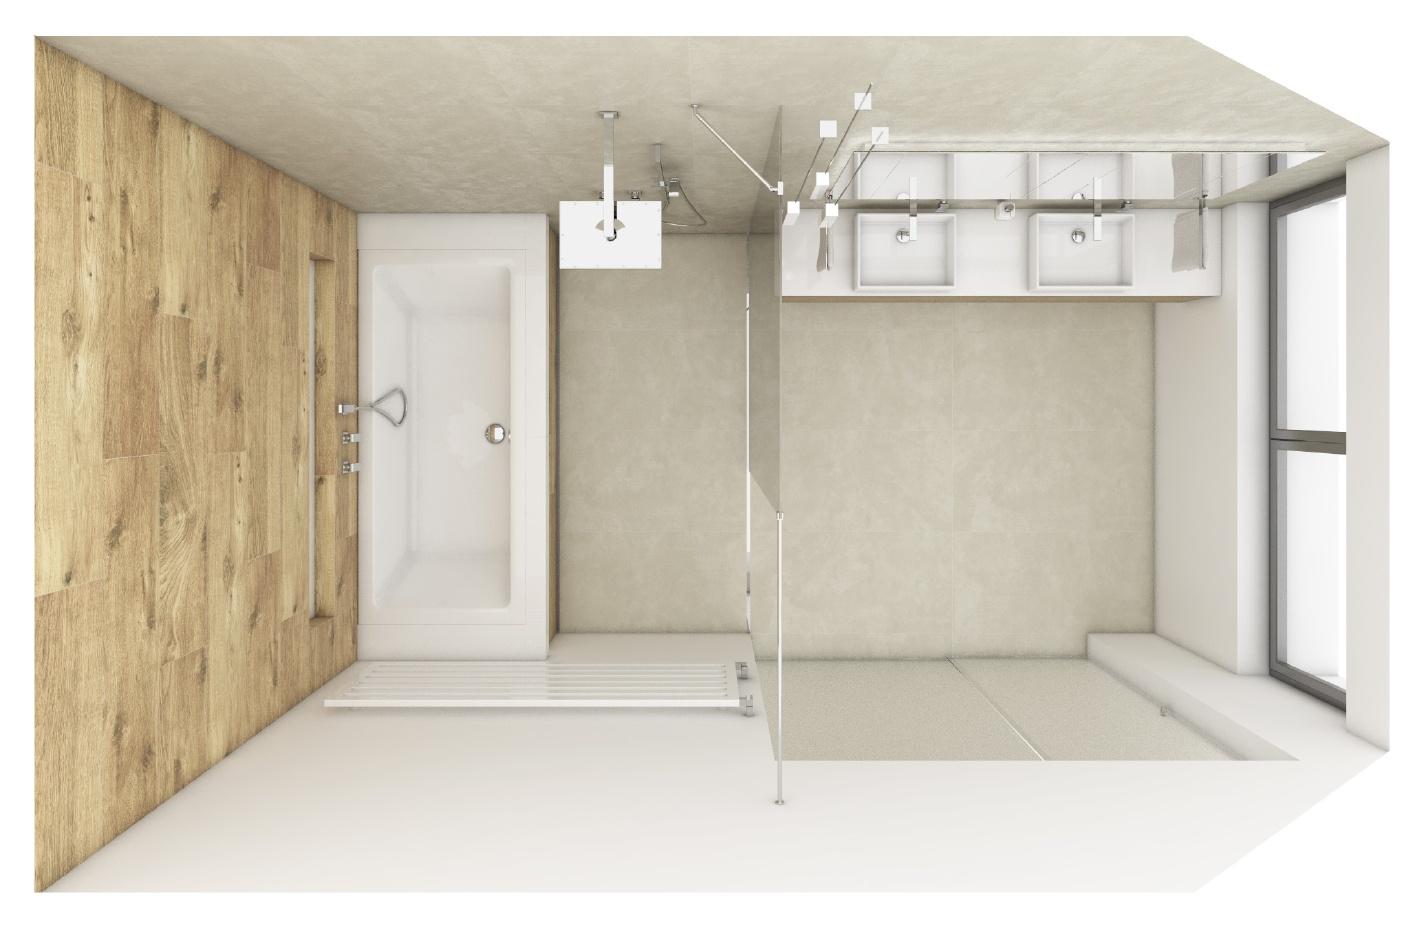 modernes badezimmer sand | perfecto design, Badezimmer ideen